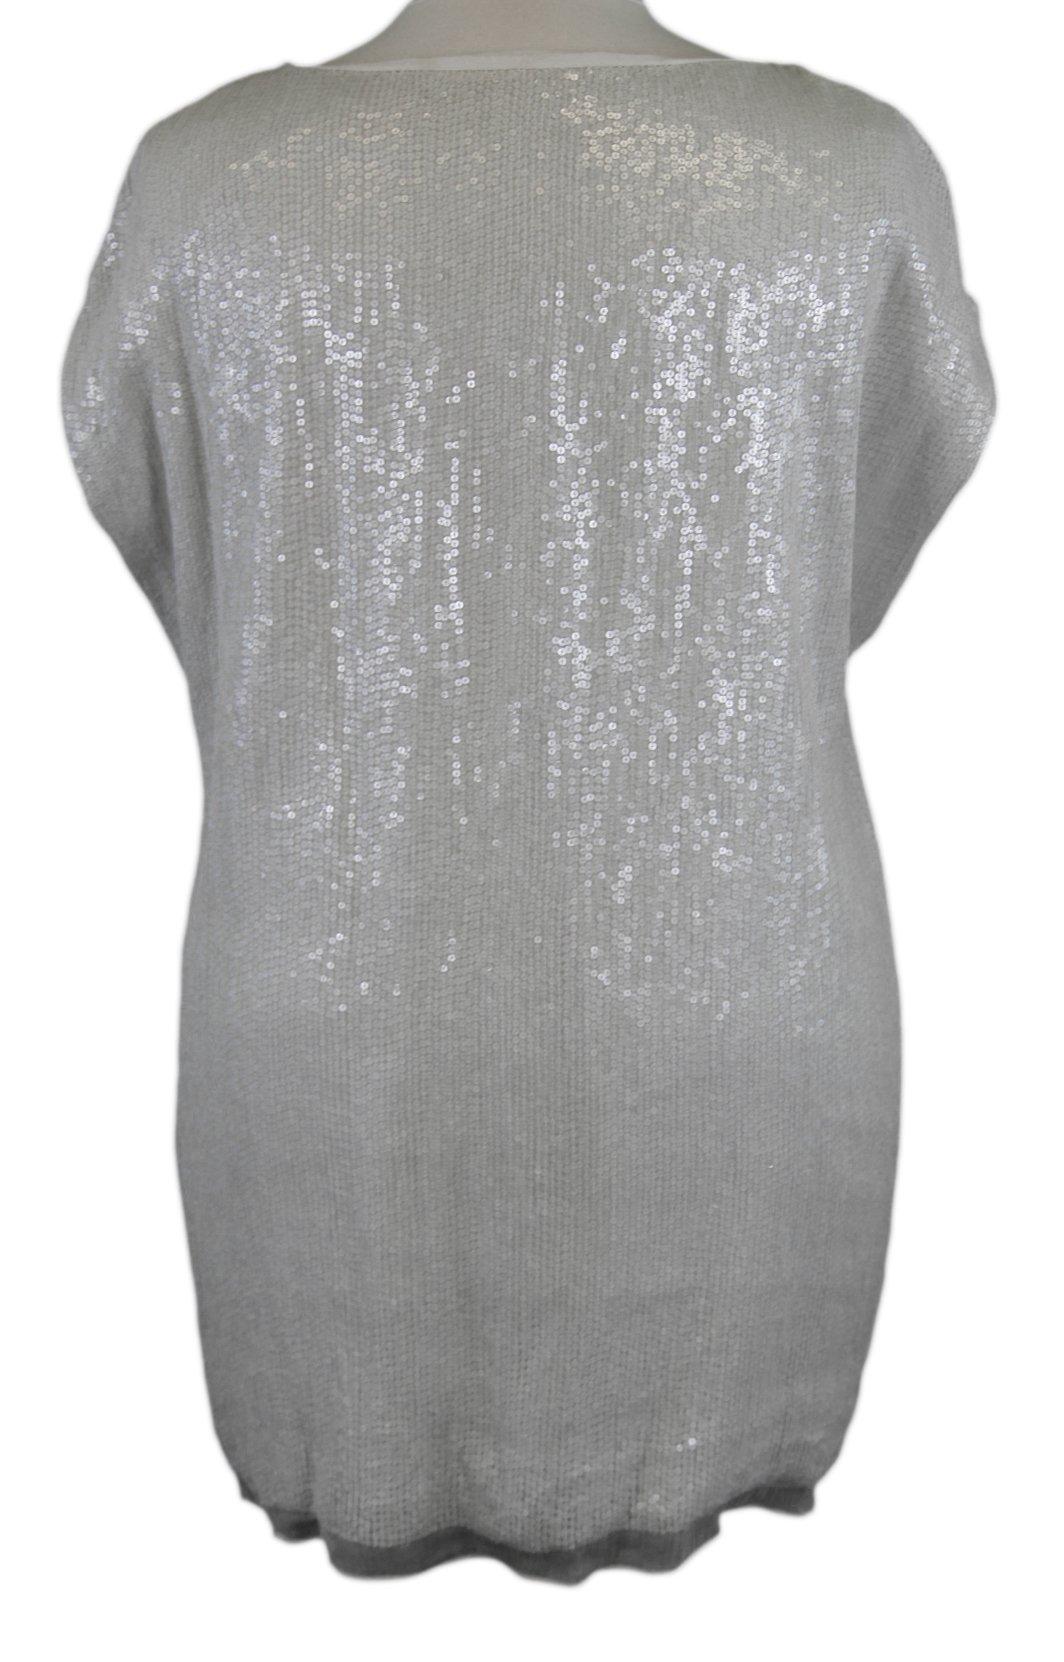 MARINA RINALDI by MaxMara Farsi Cream Sequin Embellished Top 18W / 27 by Marina Rinaldi by Max Mara (Image #2)